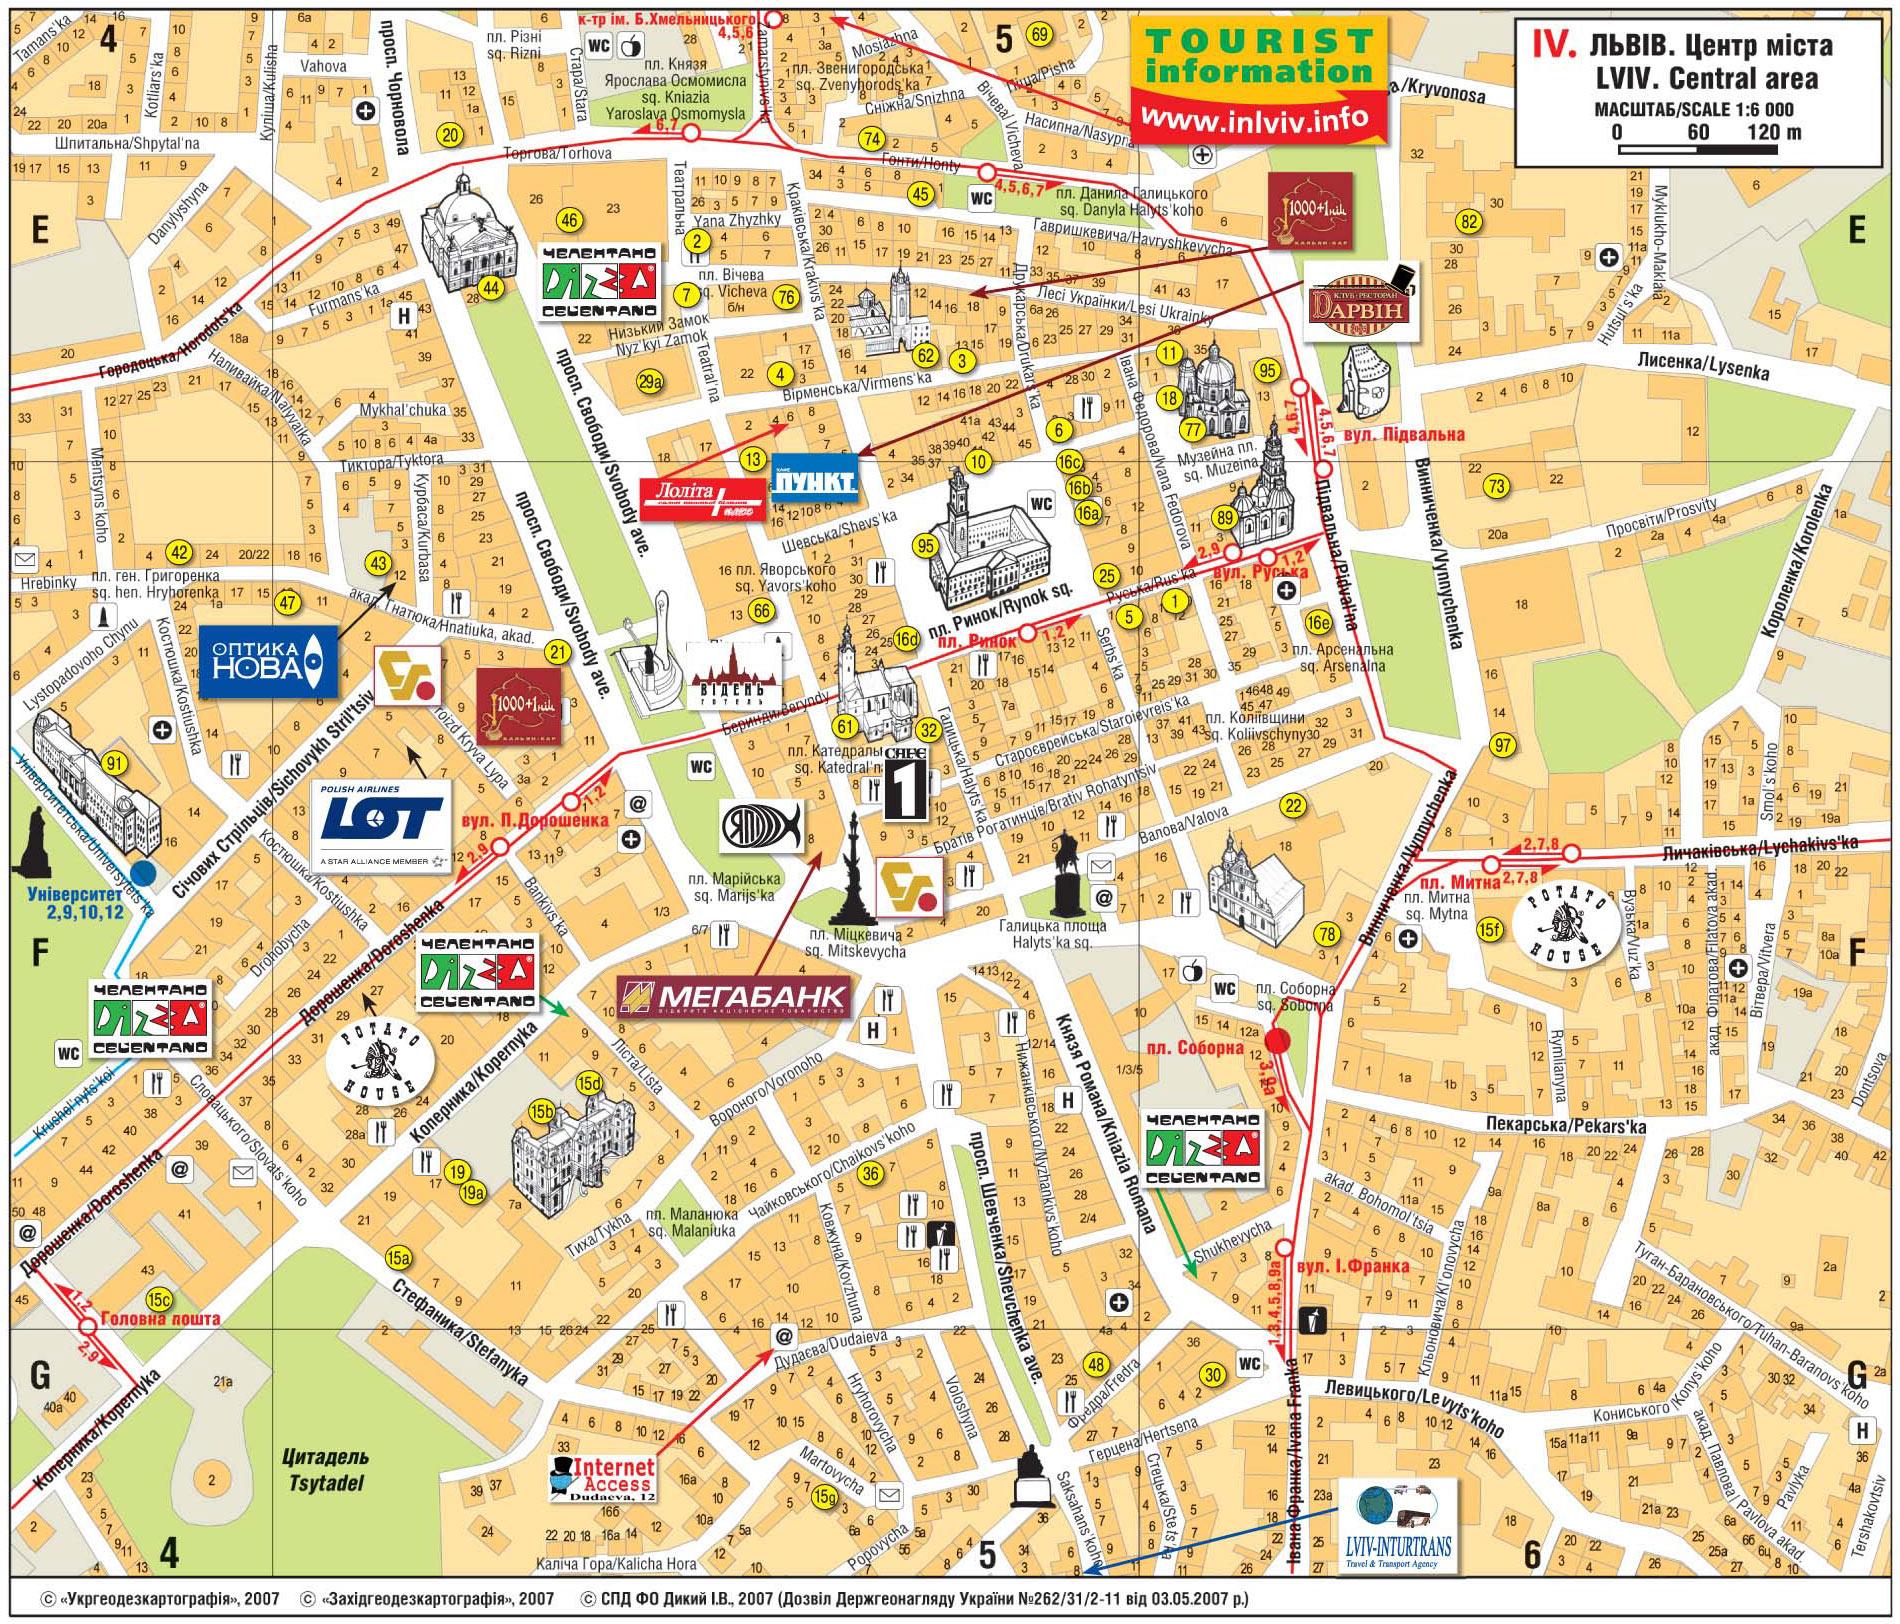 budapest public transport map pdf